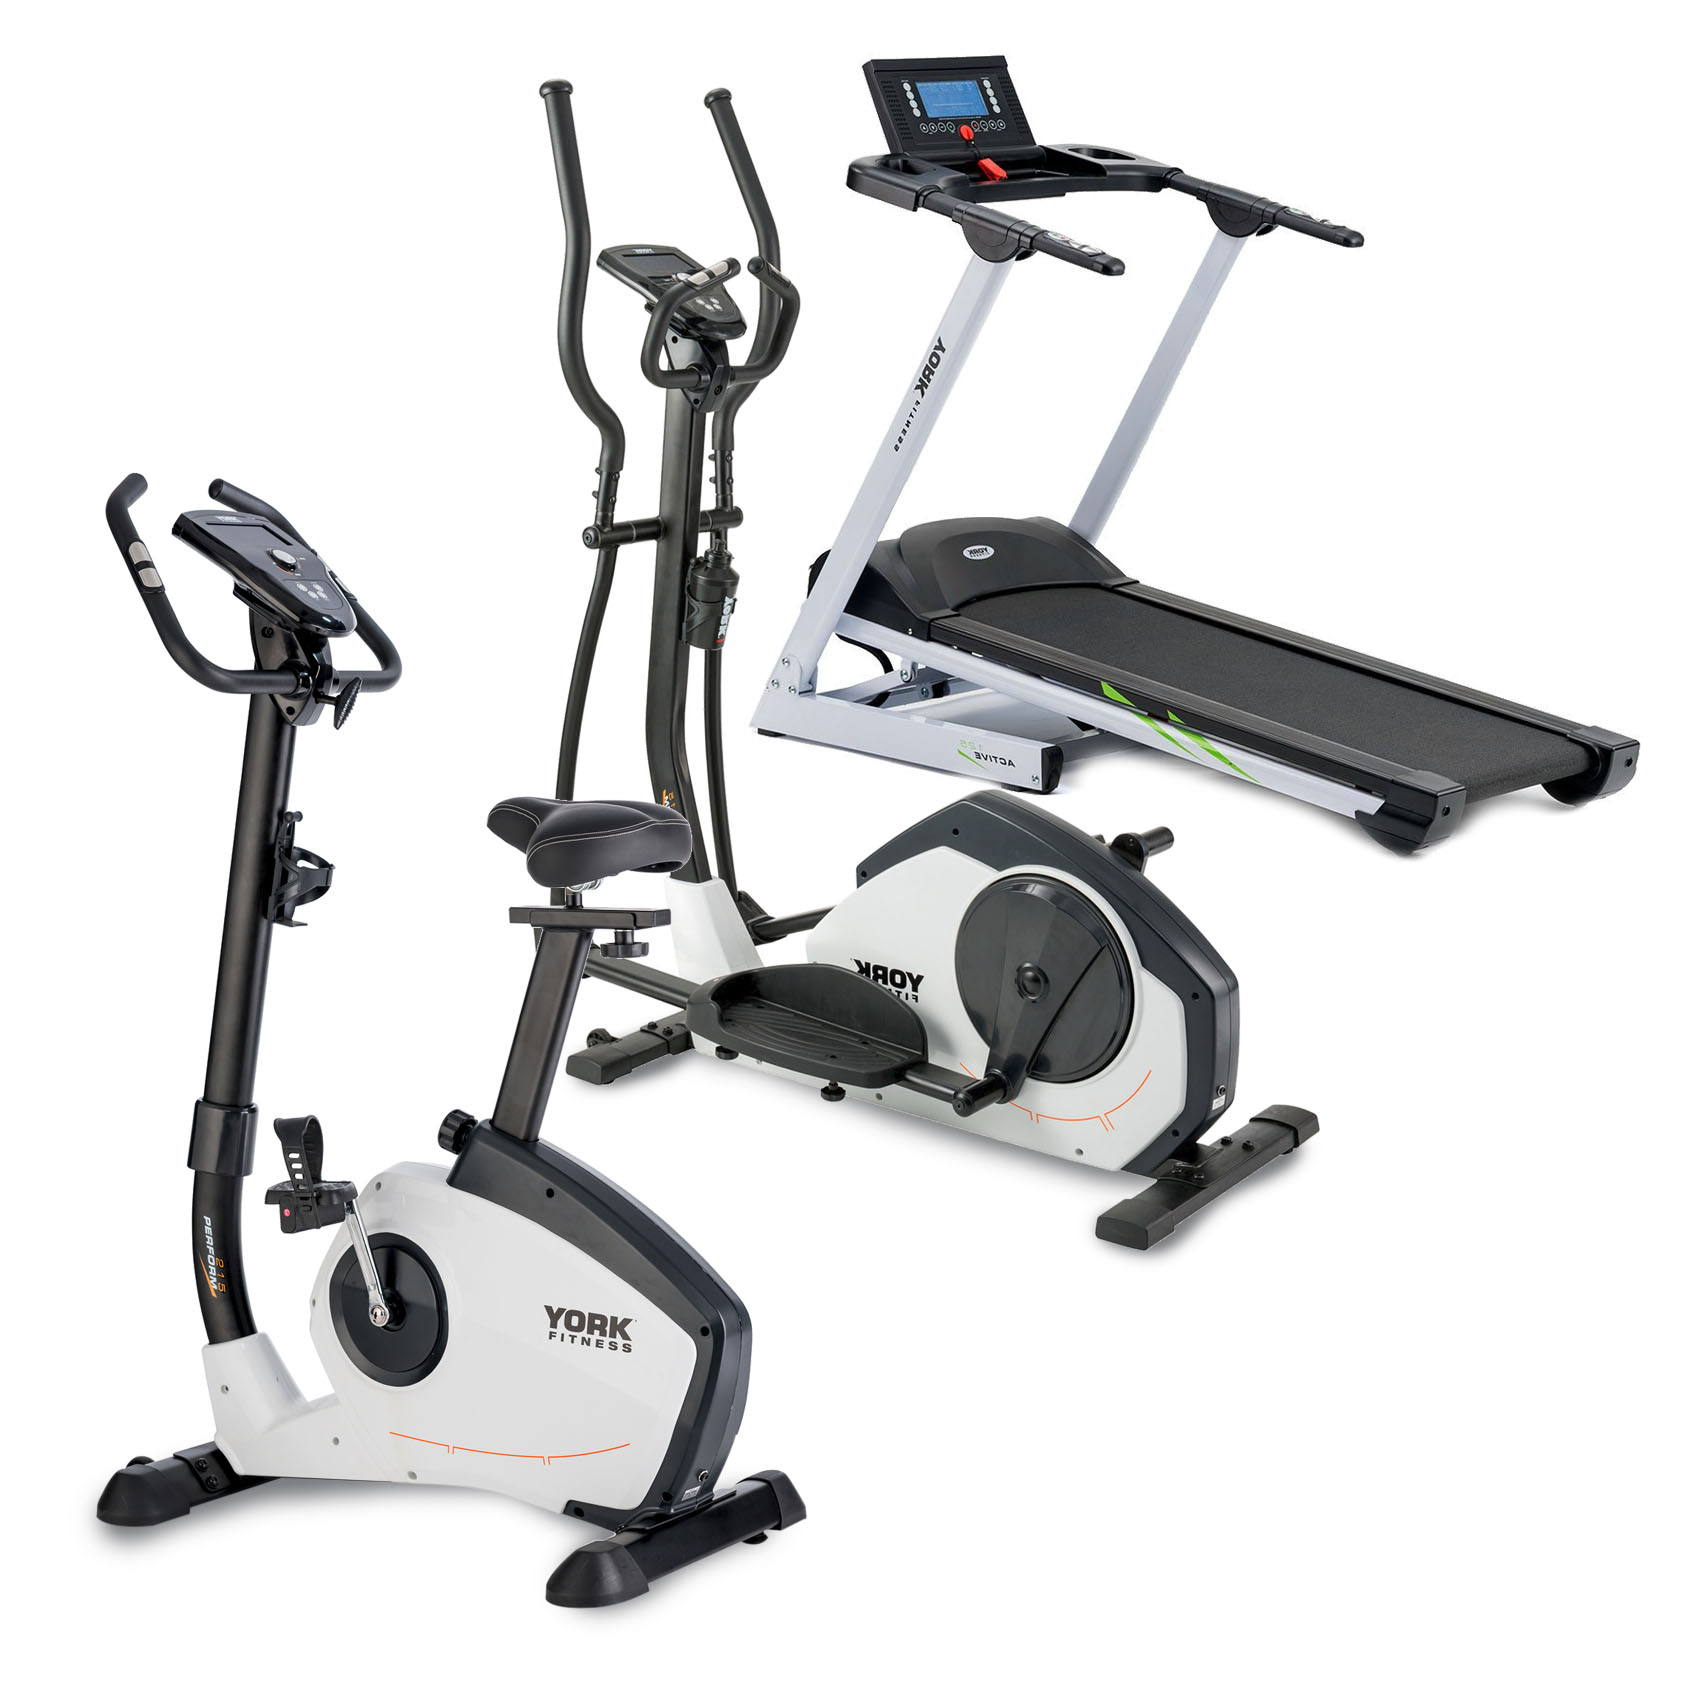 Elliptical Bike Or Treadmill: York Fitness Complete Cardio Package